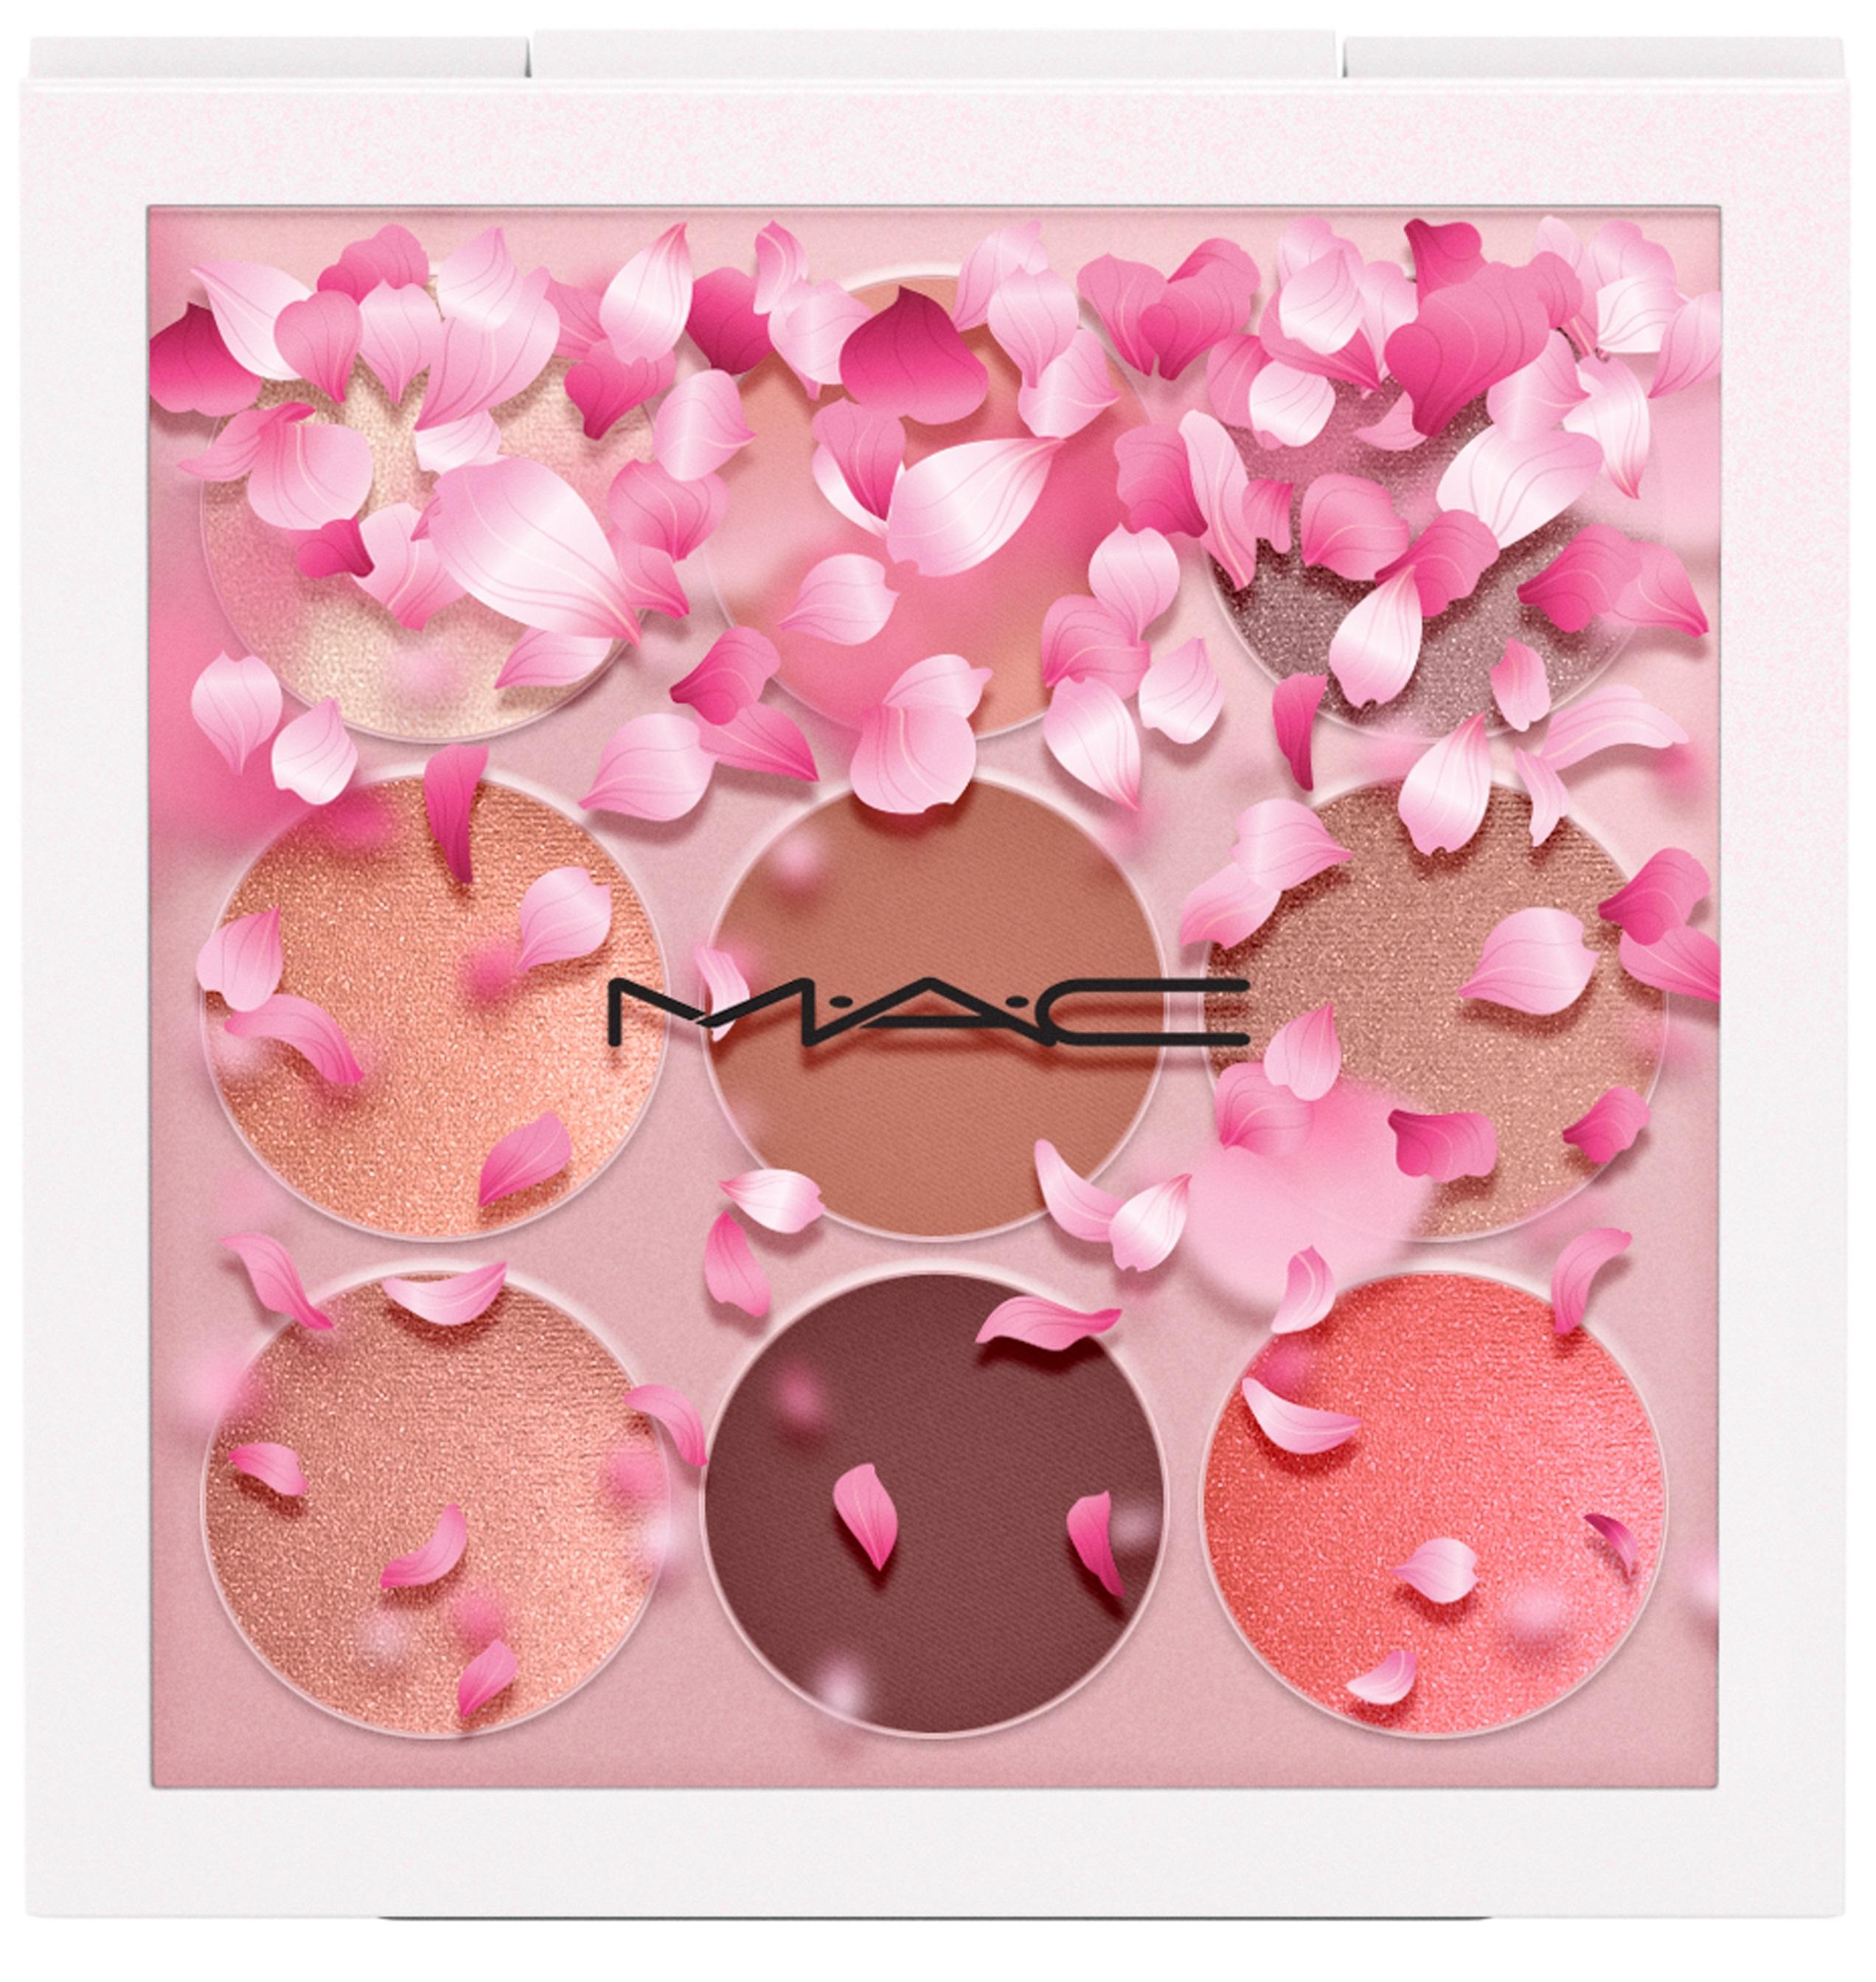 MAC_BoomBoomBloom_EyeShadowX9_KabukiDoll_white_39,50EUR_300dpi_3